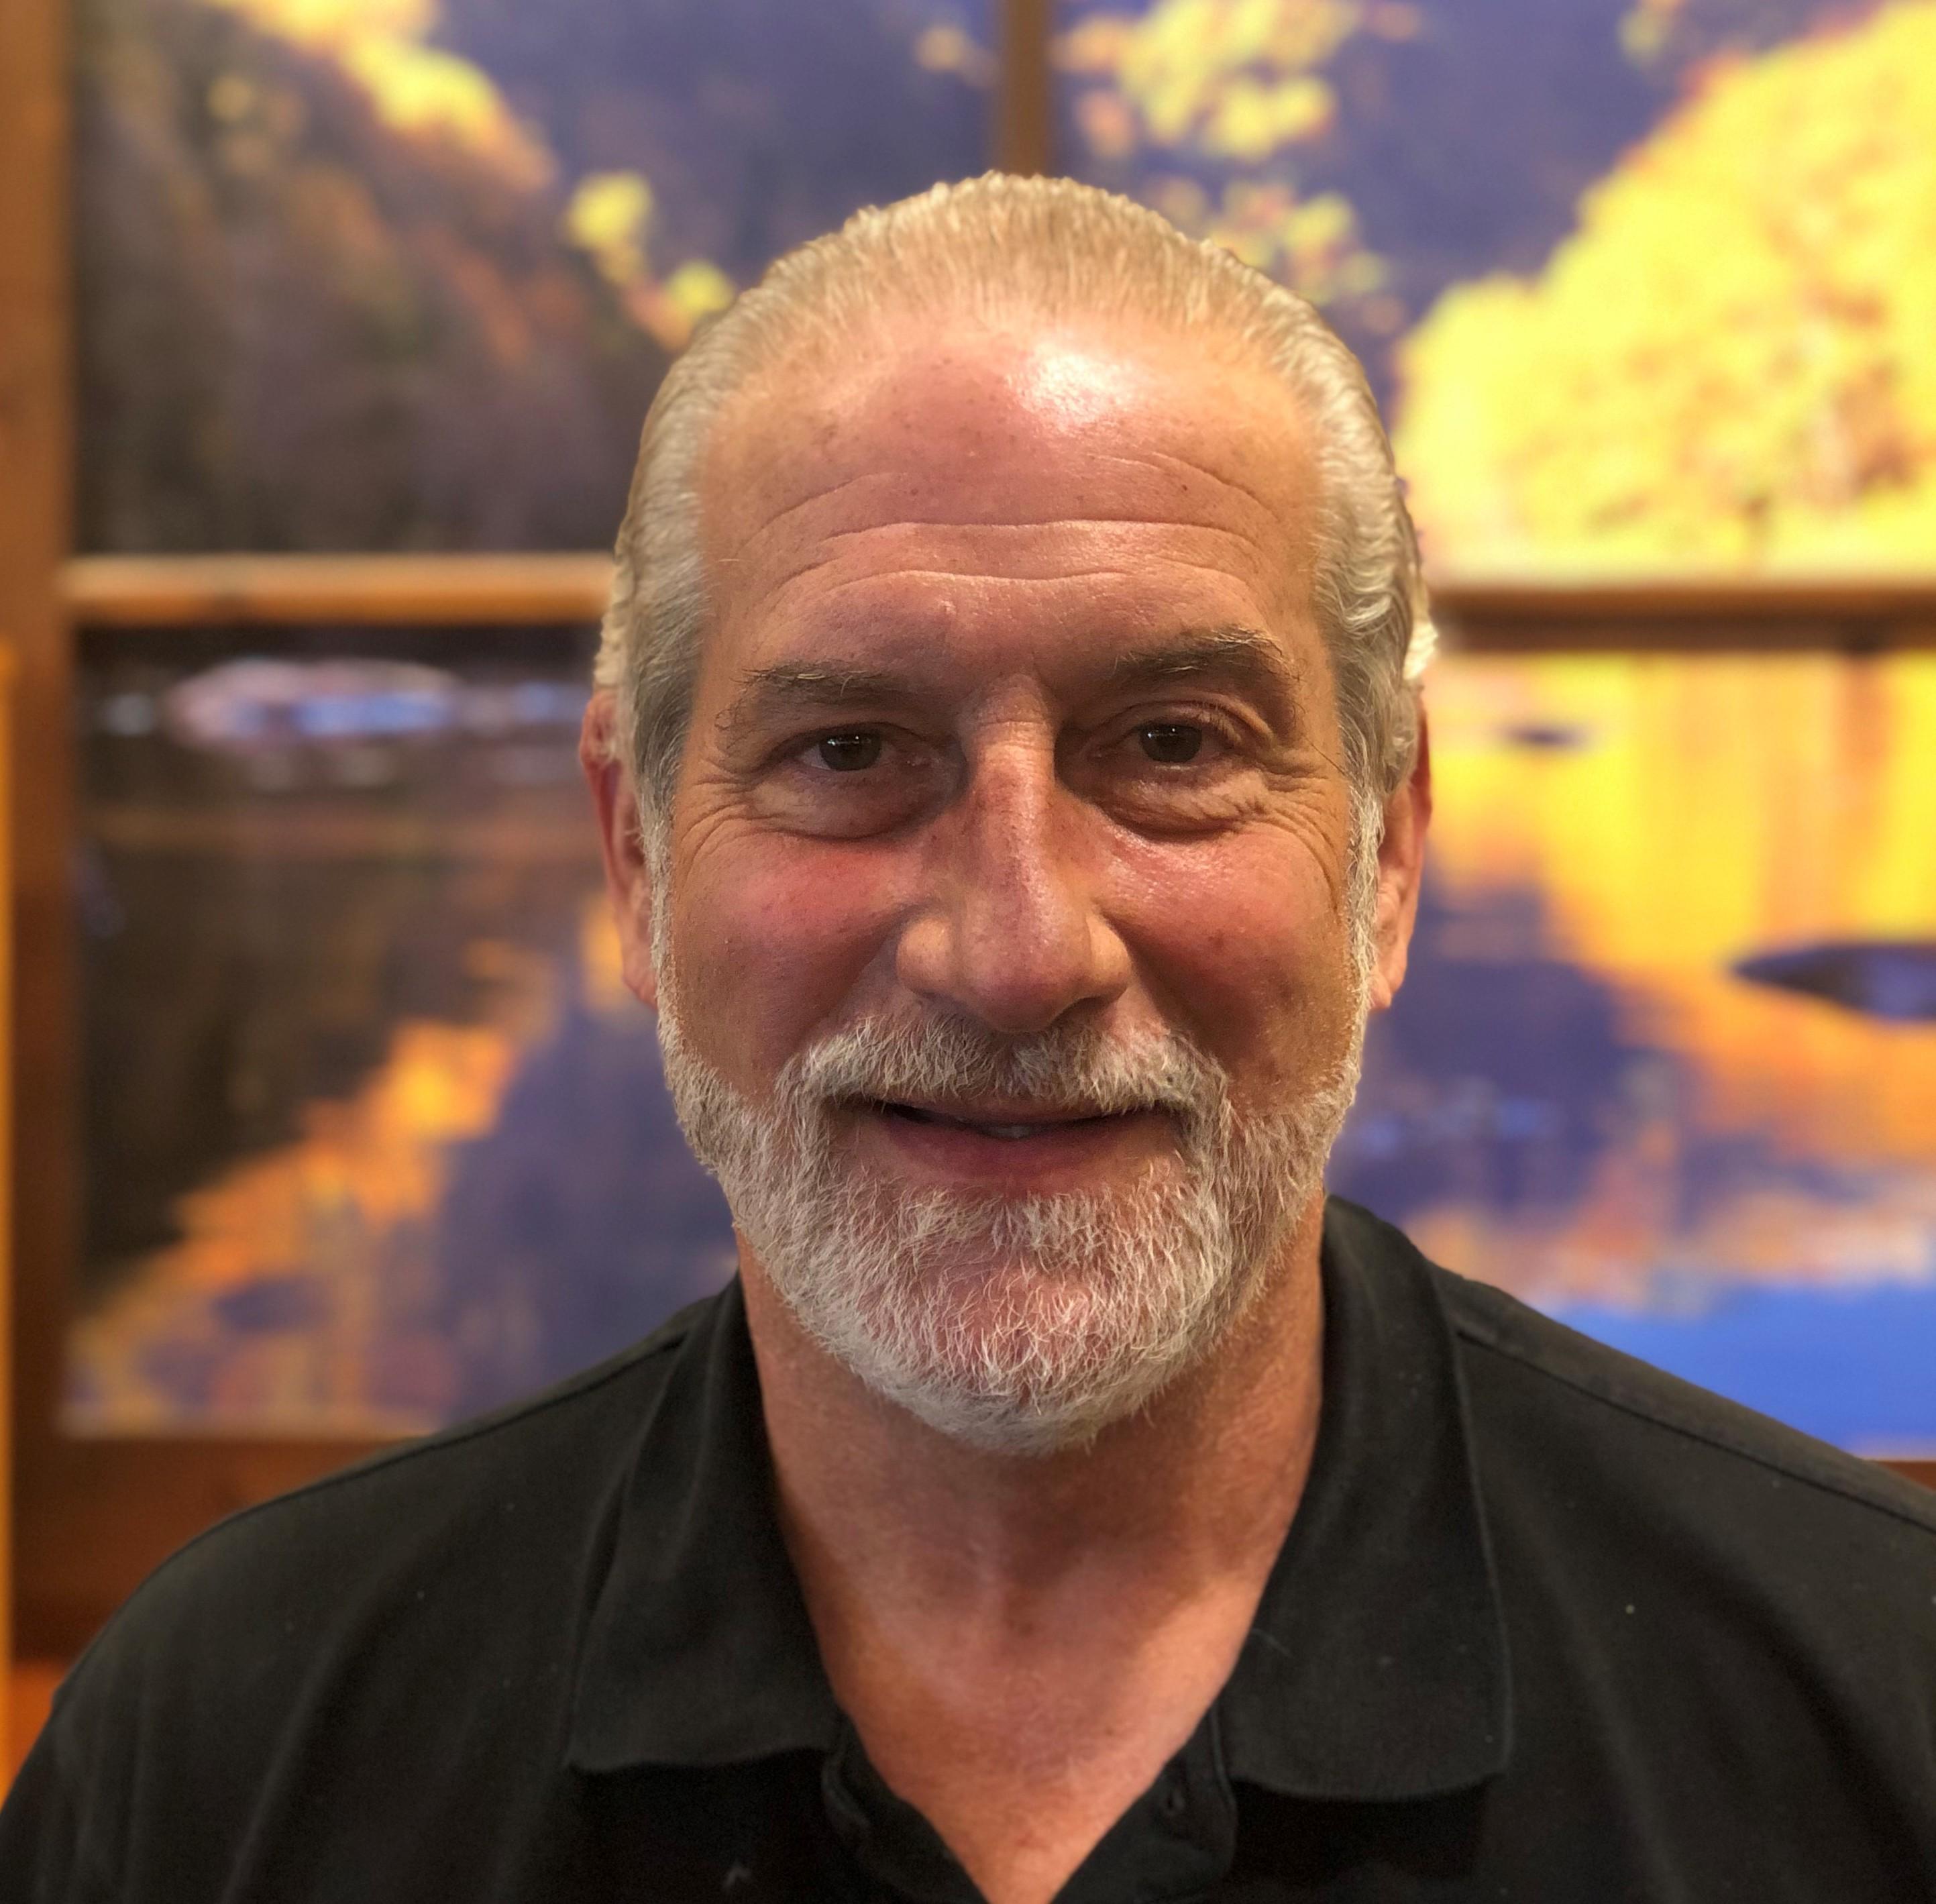 Orvis Retail Store - Plymouth Meeting, Pennsylvania - Store Manager Joe Fedullo